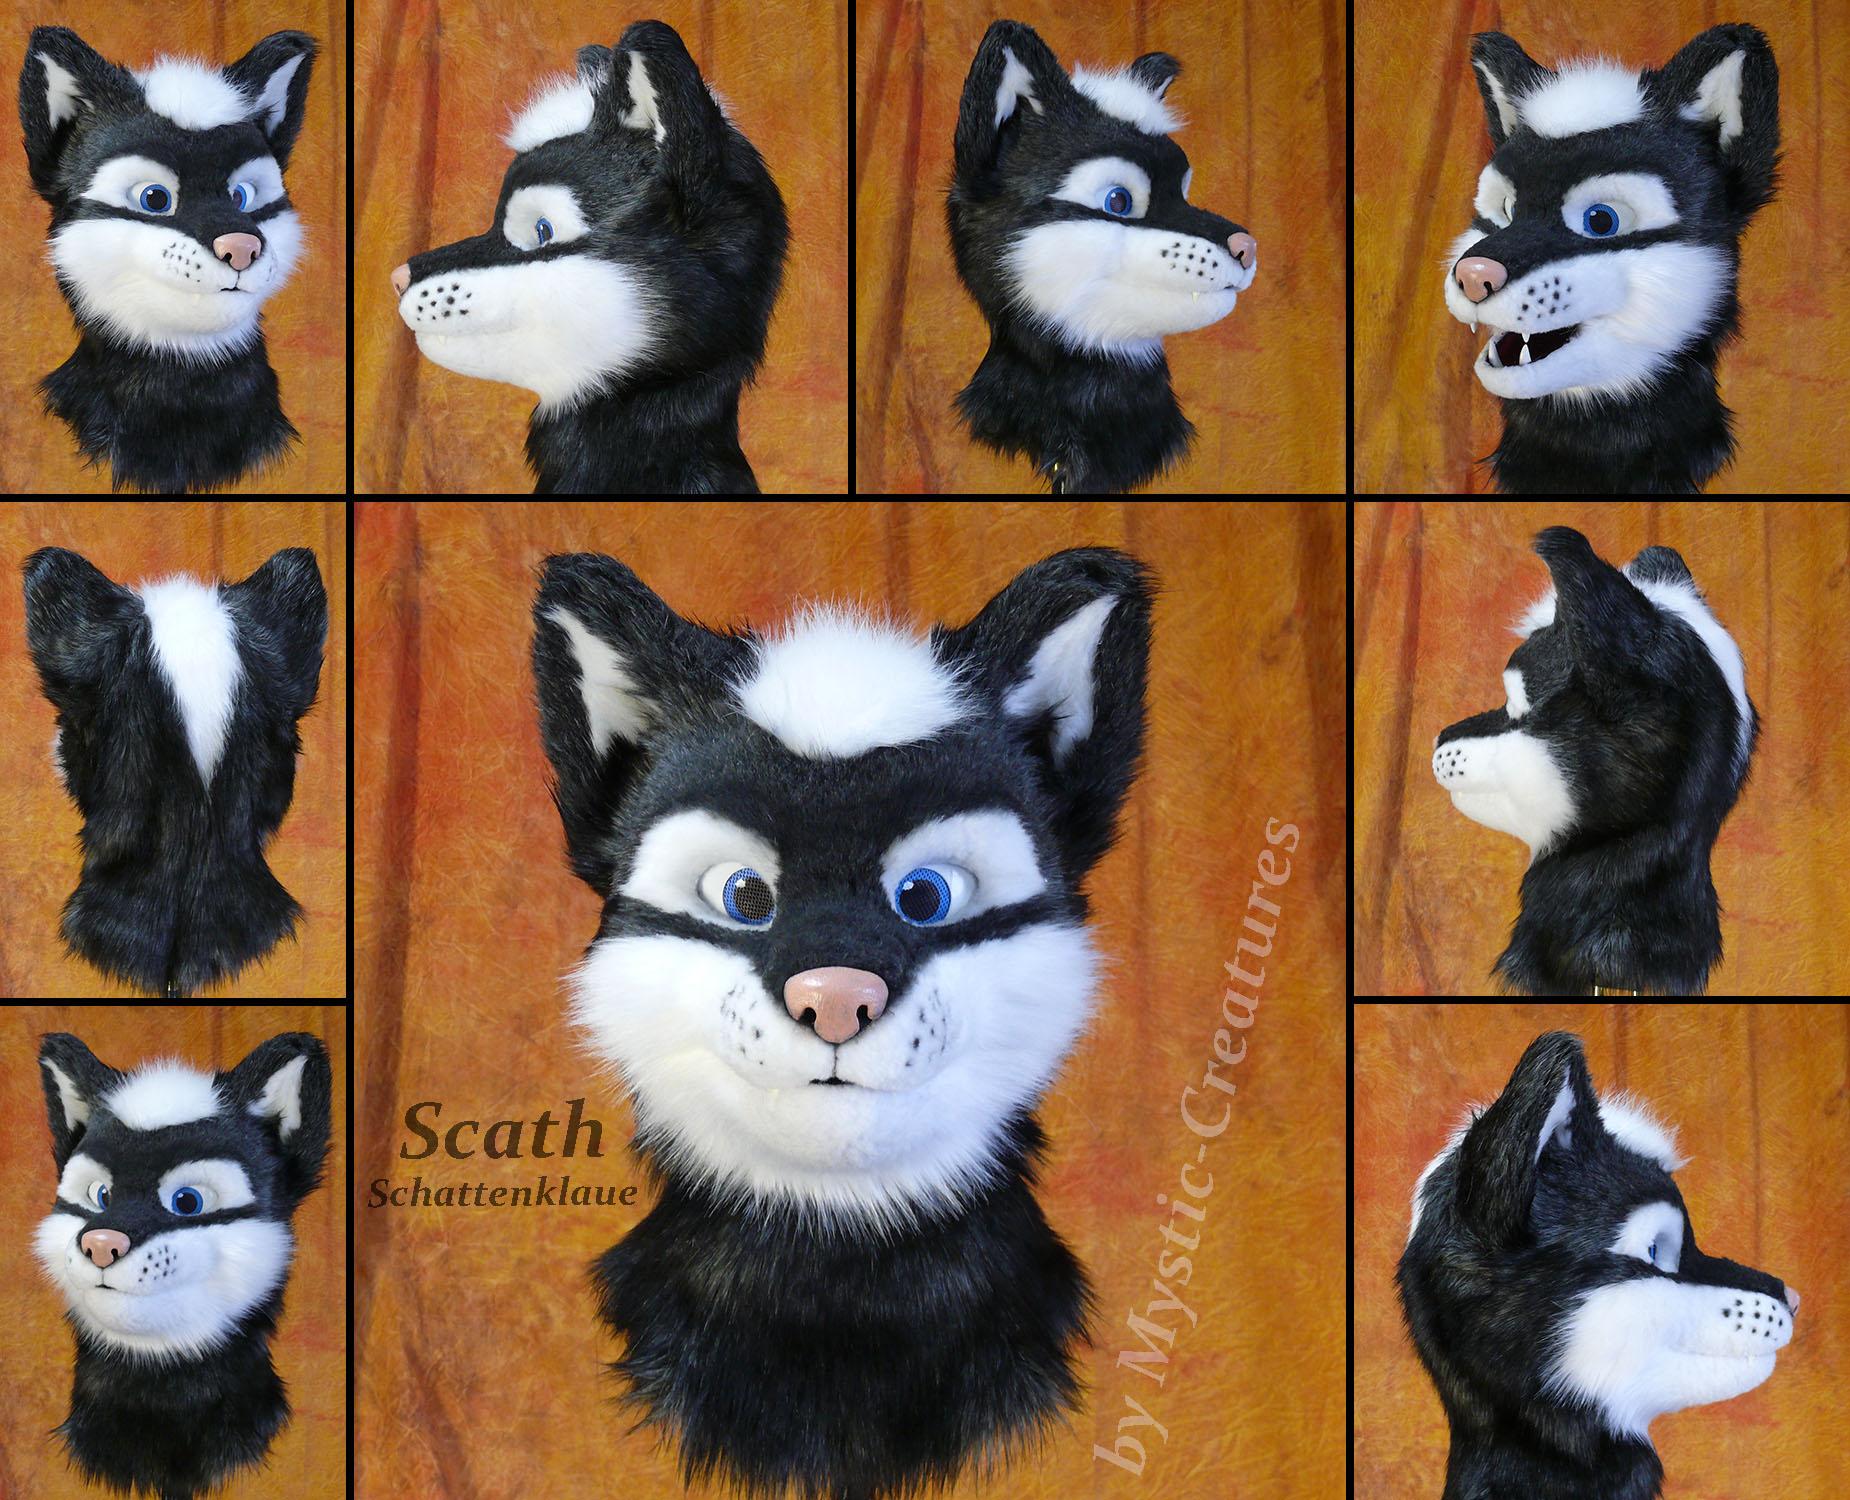 Scath Schattenklaue - Partial fursuit wolf head by Mystic-Creatures